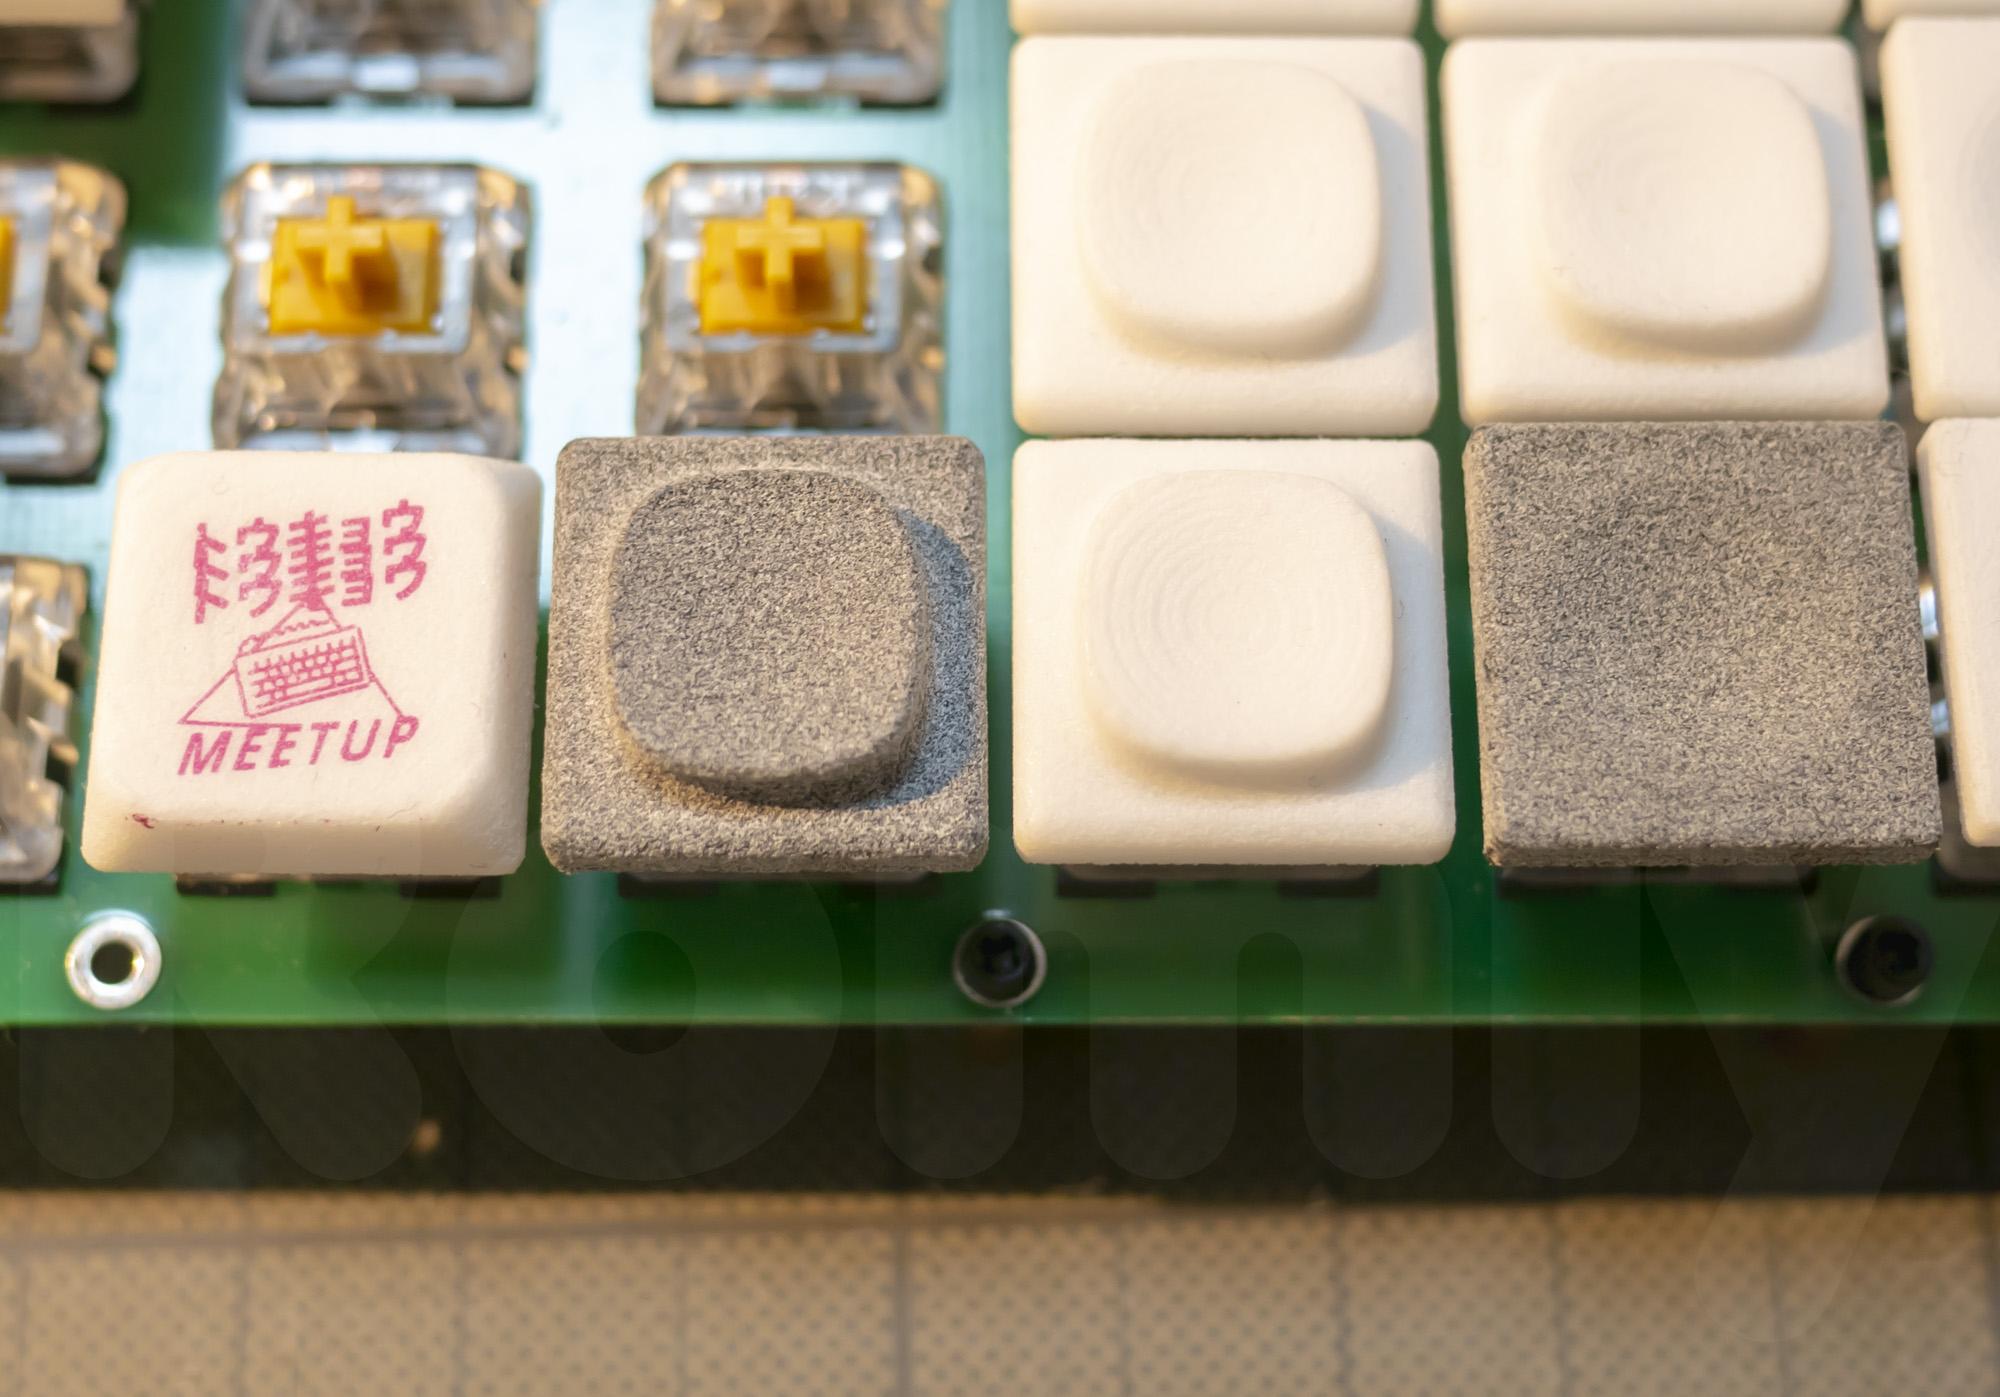 DMM.make MJF Fancy Keycap compare to Nylon